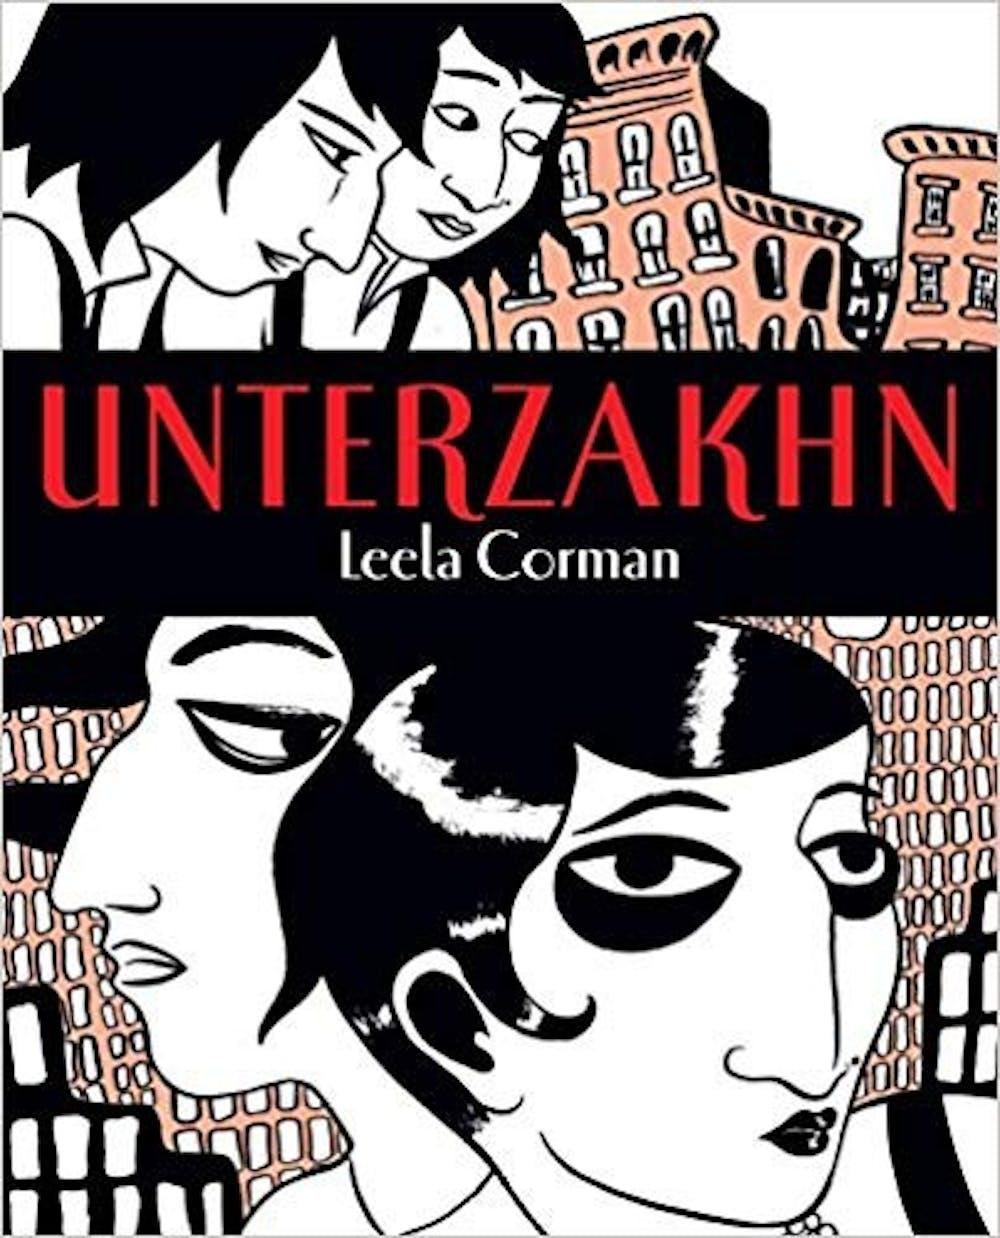 leela-corman-graphic-novel-courtesy-schocken-books